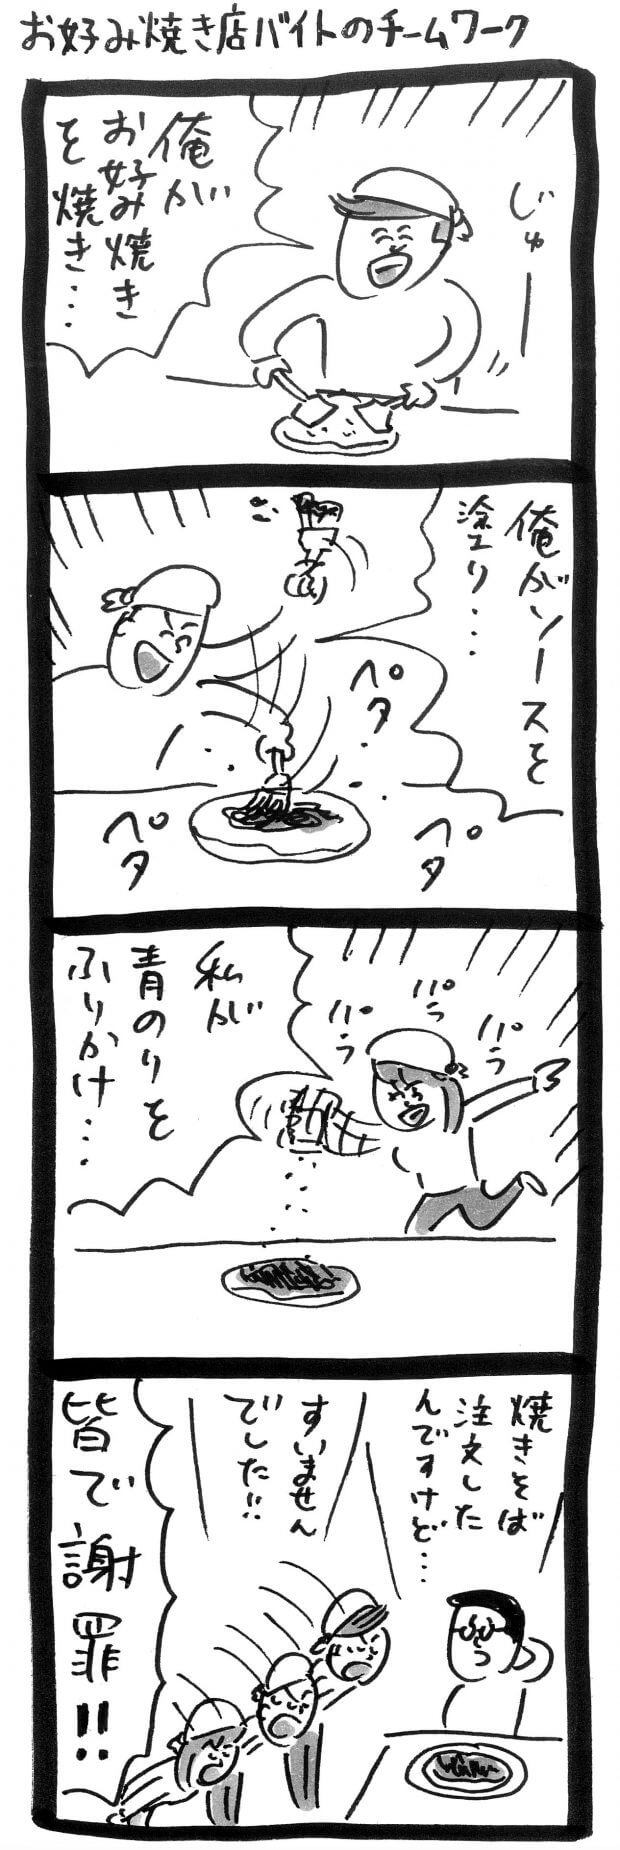 ohoshintarou_okonomiyaki